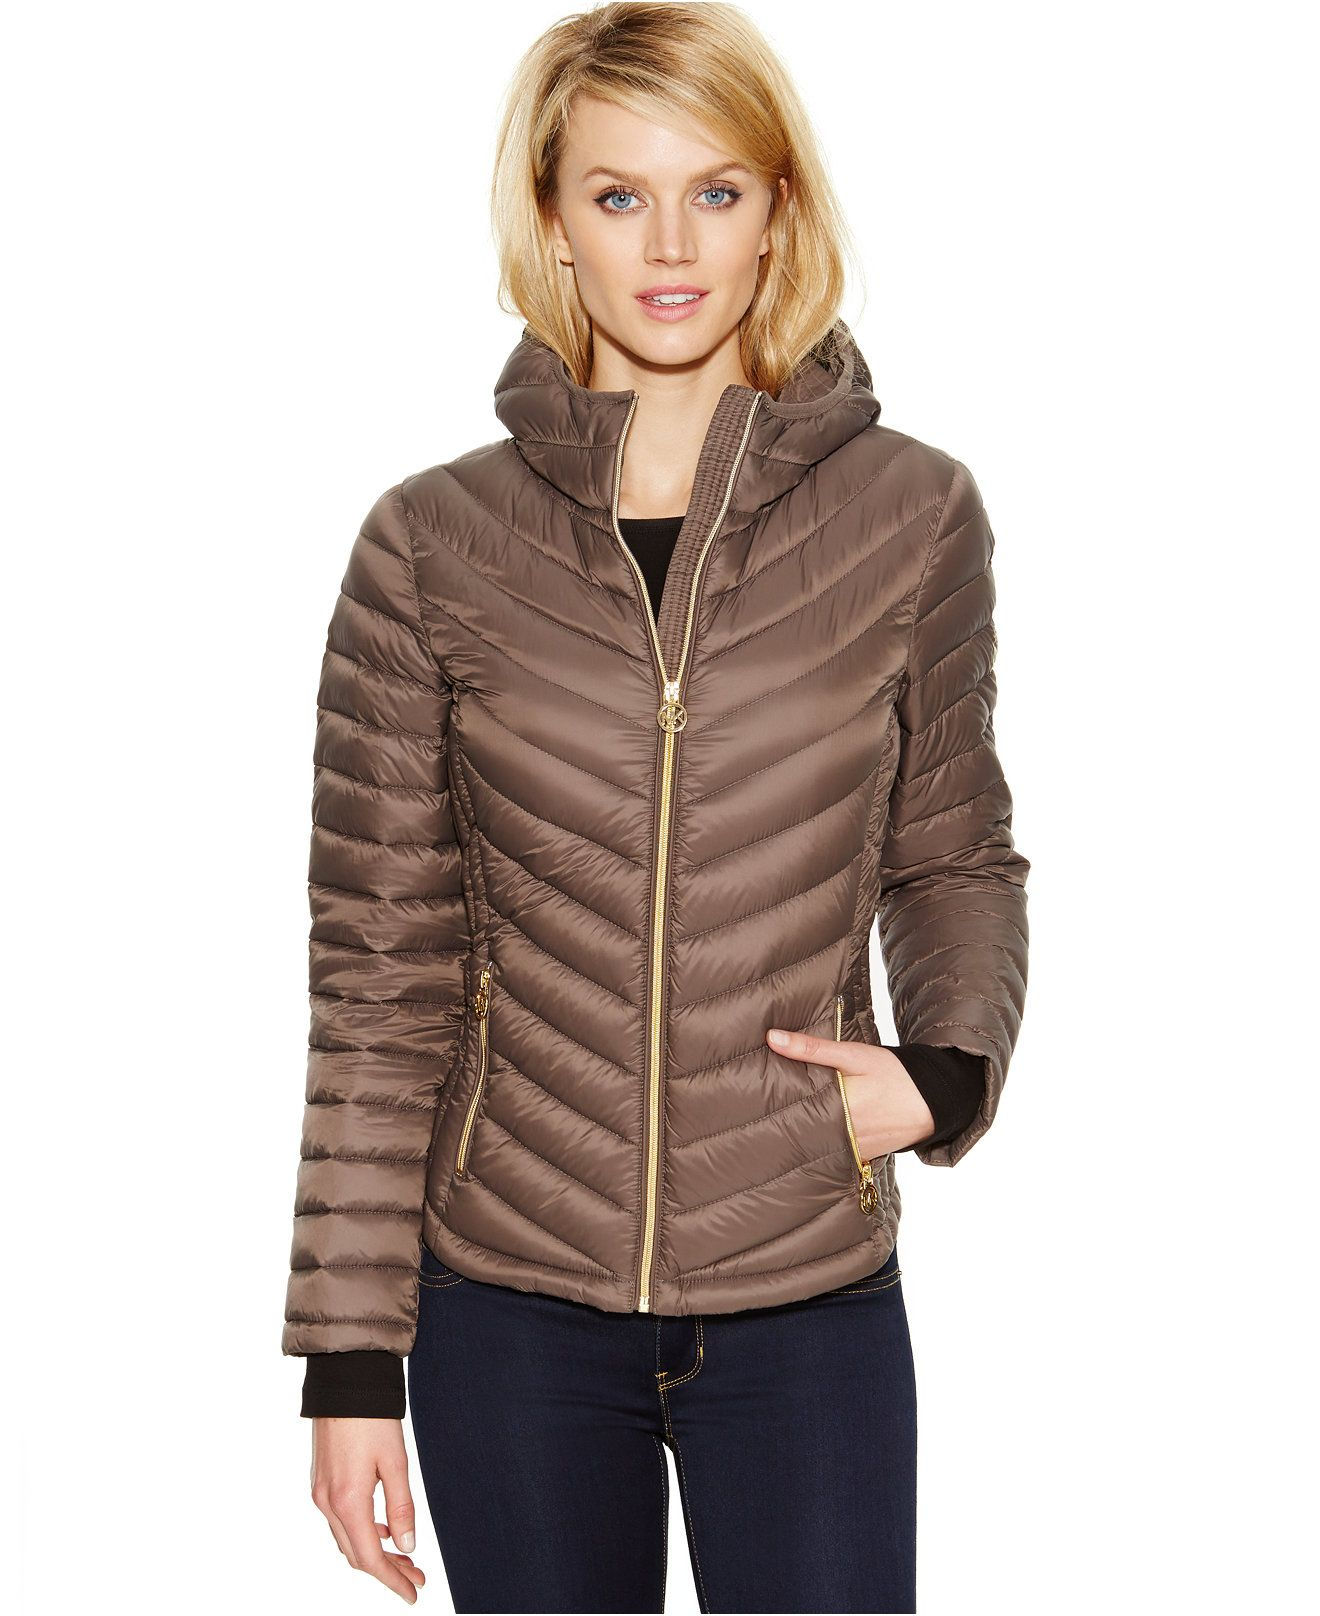 Michael Michael Kors Hooded Packable Down Coat Michael Kors Coats Jackets Women Macy S Michael Kors Coats Coats Jackets Women Coats For Women [ 1616 x 1320 Pixel ]